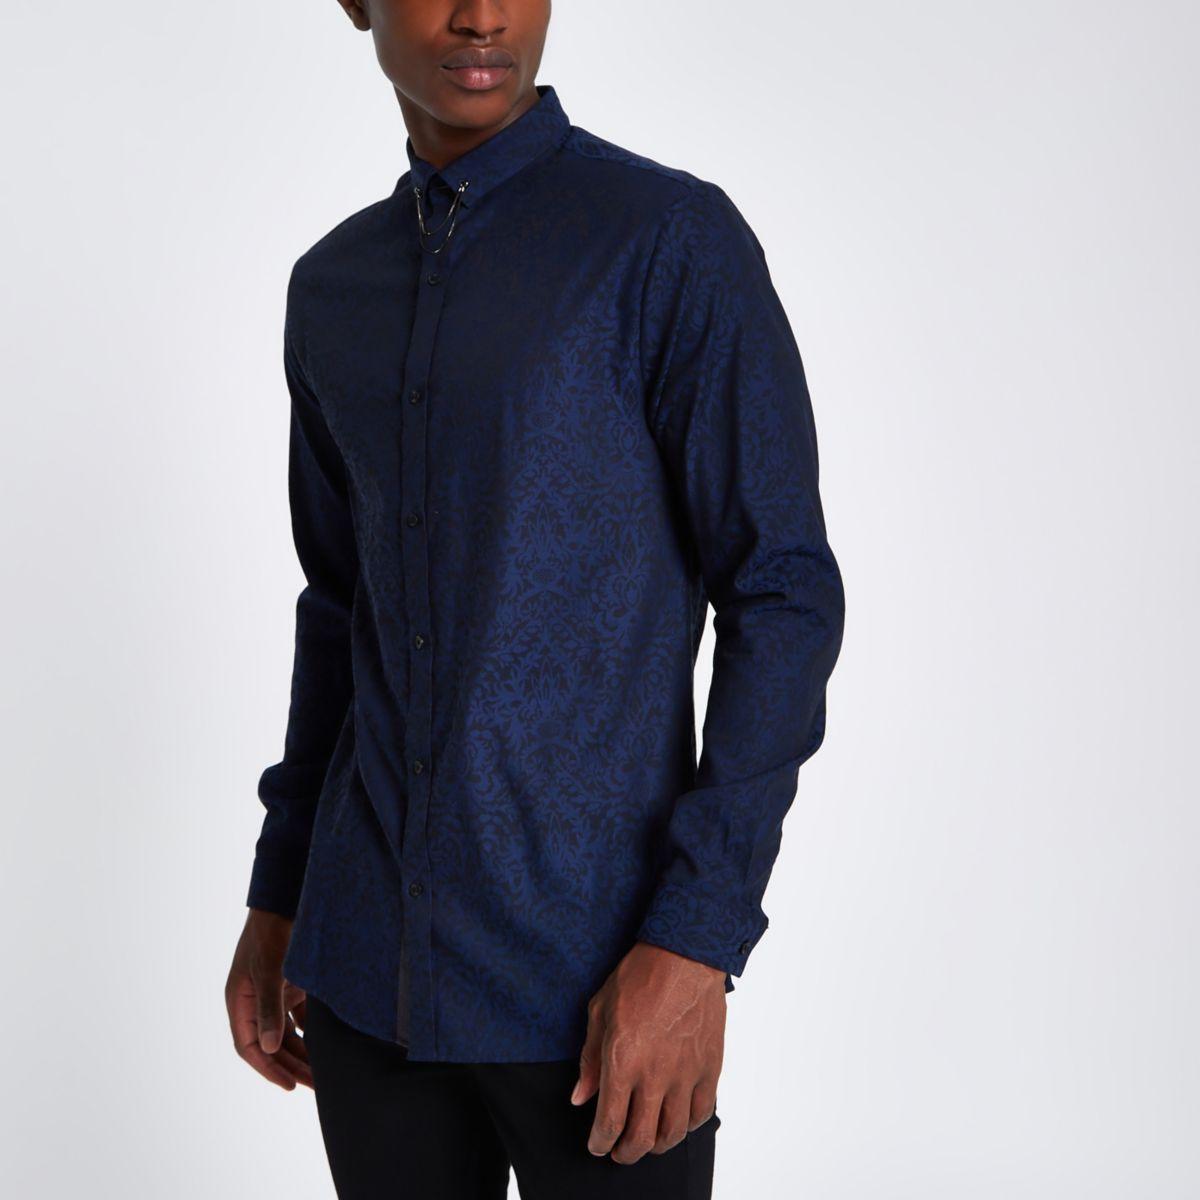 Navy jacquard printed slim fit shirt